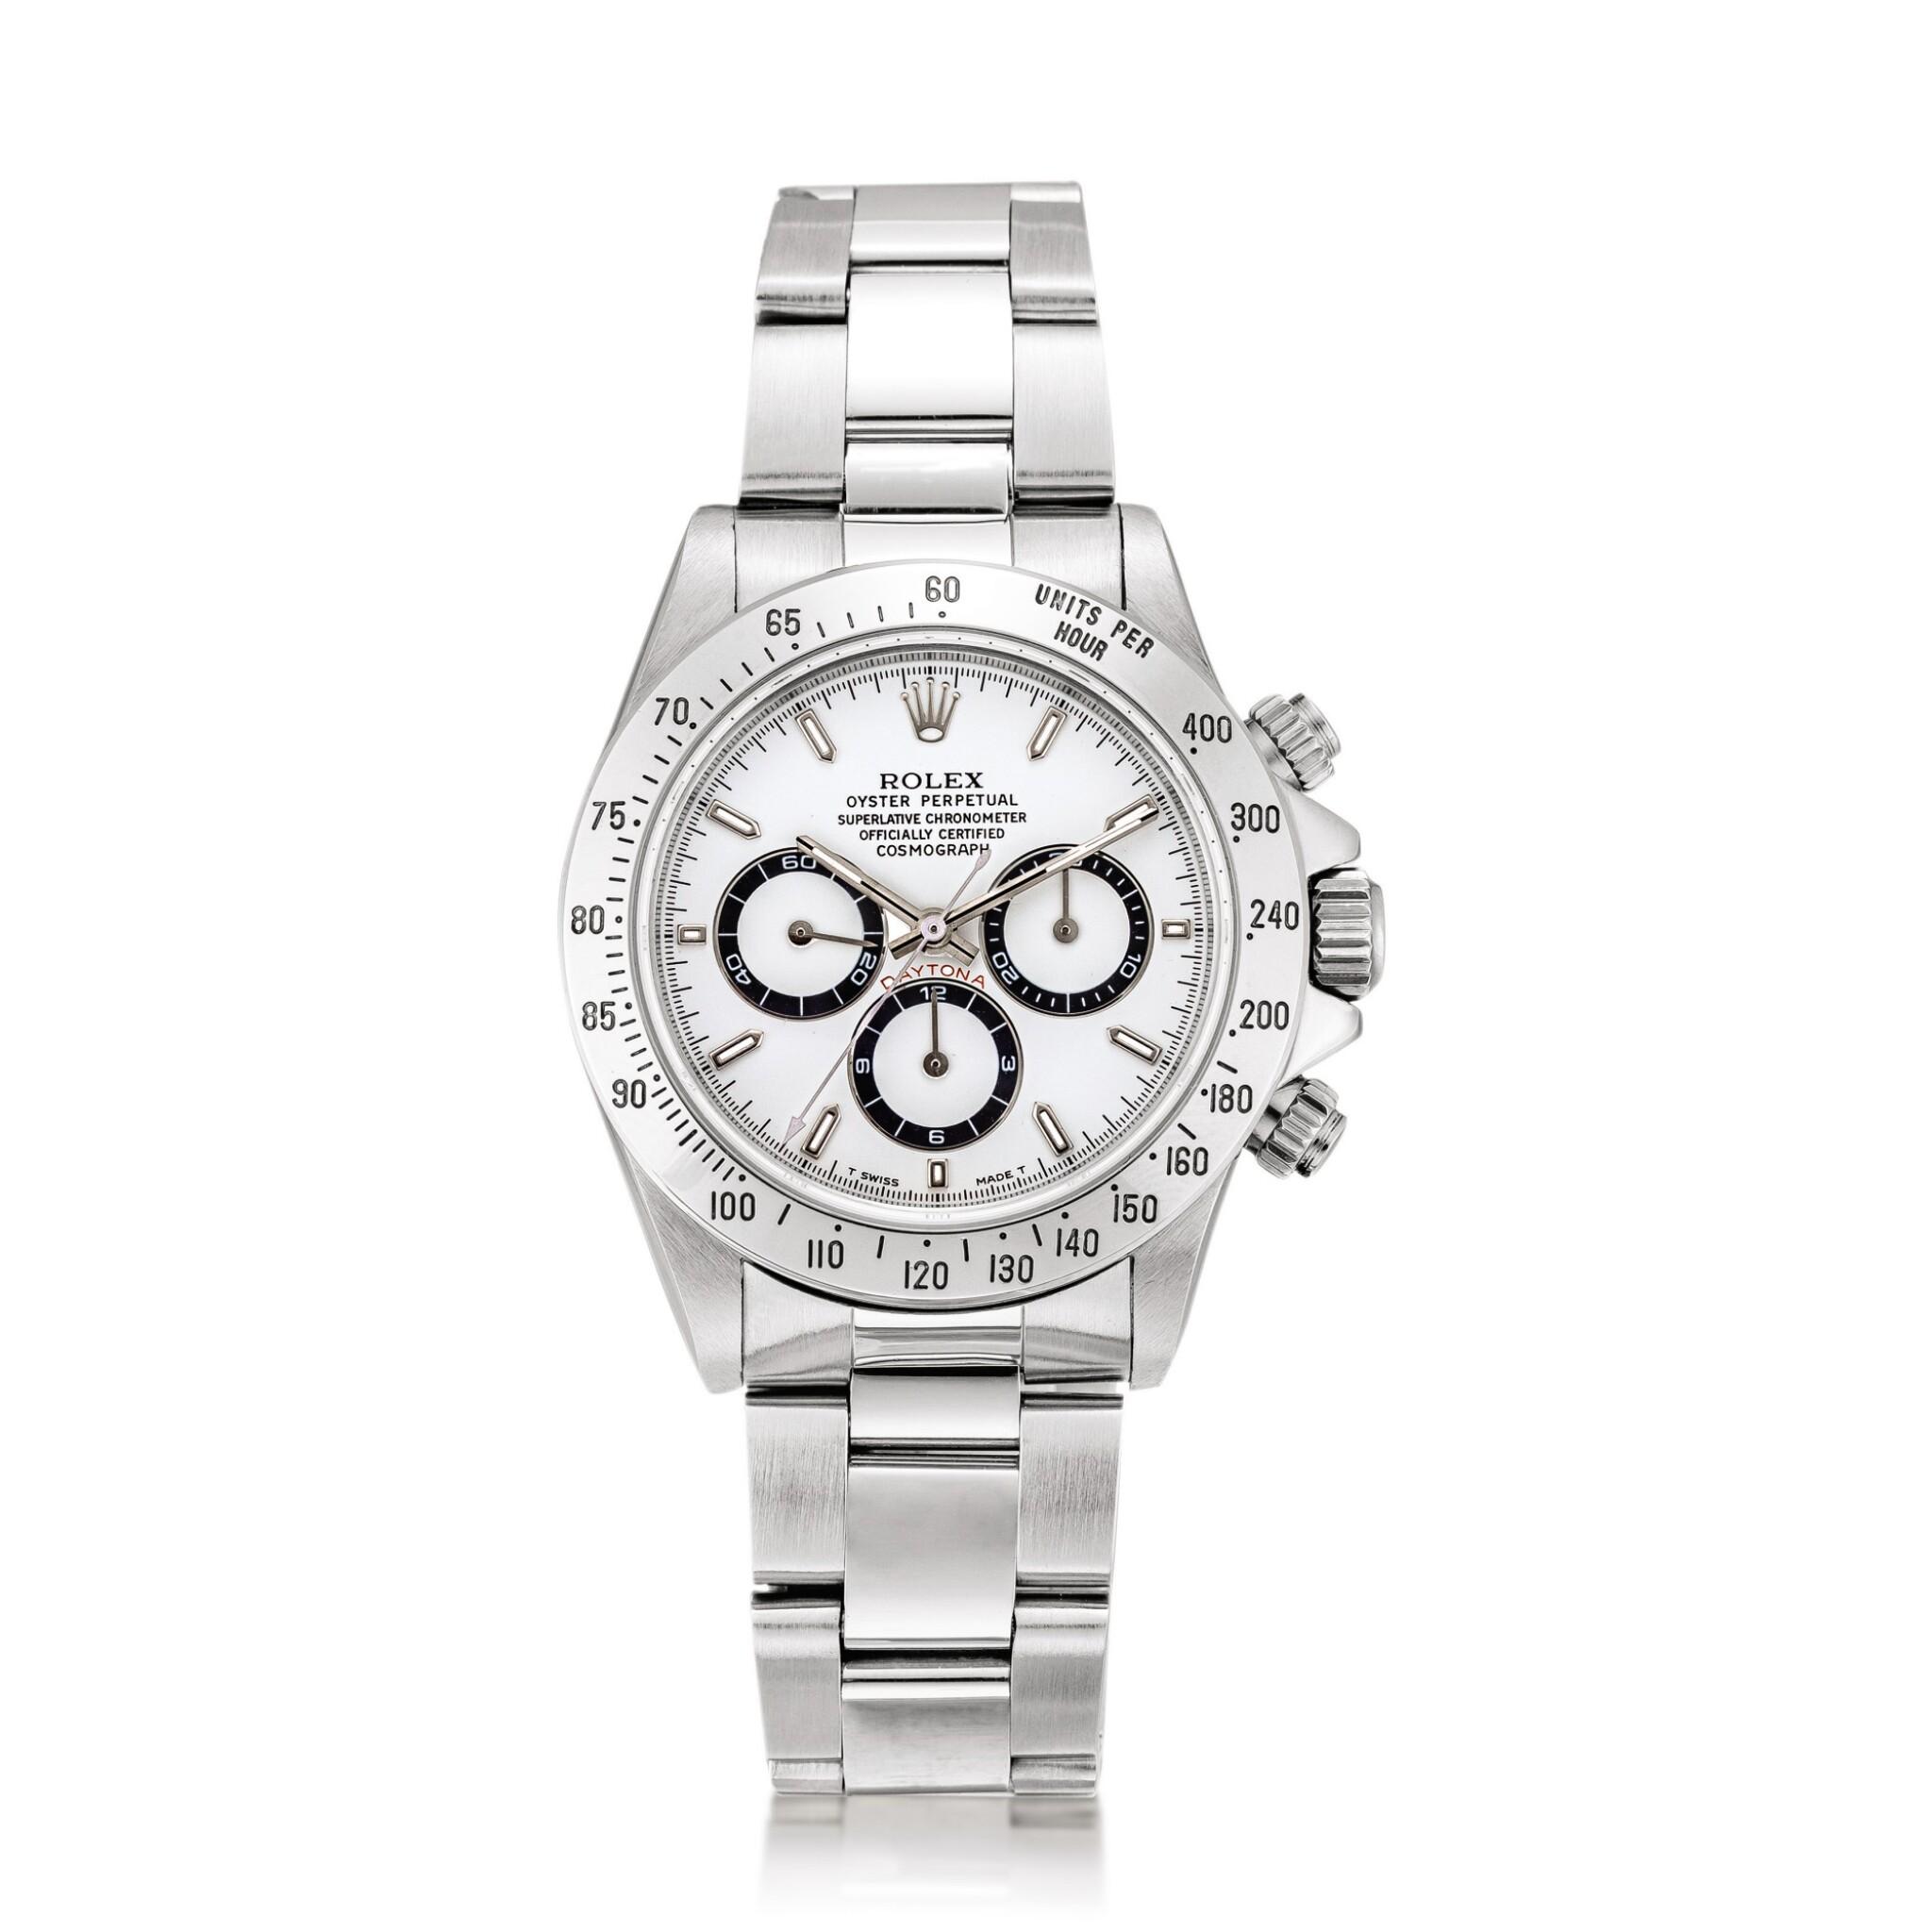 View full screen - View 1 of Lot 2148. Rolex | Cosmograph Daytona, Reference 16520, A stainless steel chronograph wristwatch with bracelet, Circa 1996 | 勞力士 | Cosmograph Daytona 型號16520    精鋼計時鏈帶腕錶,約1996年製.